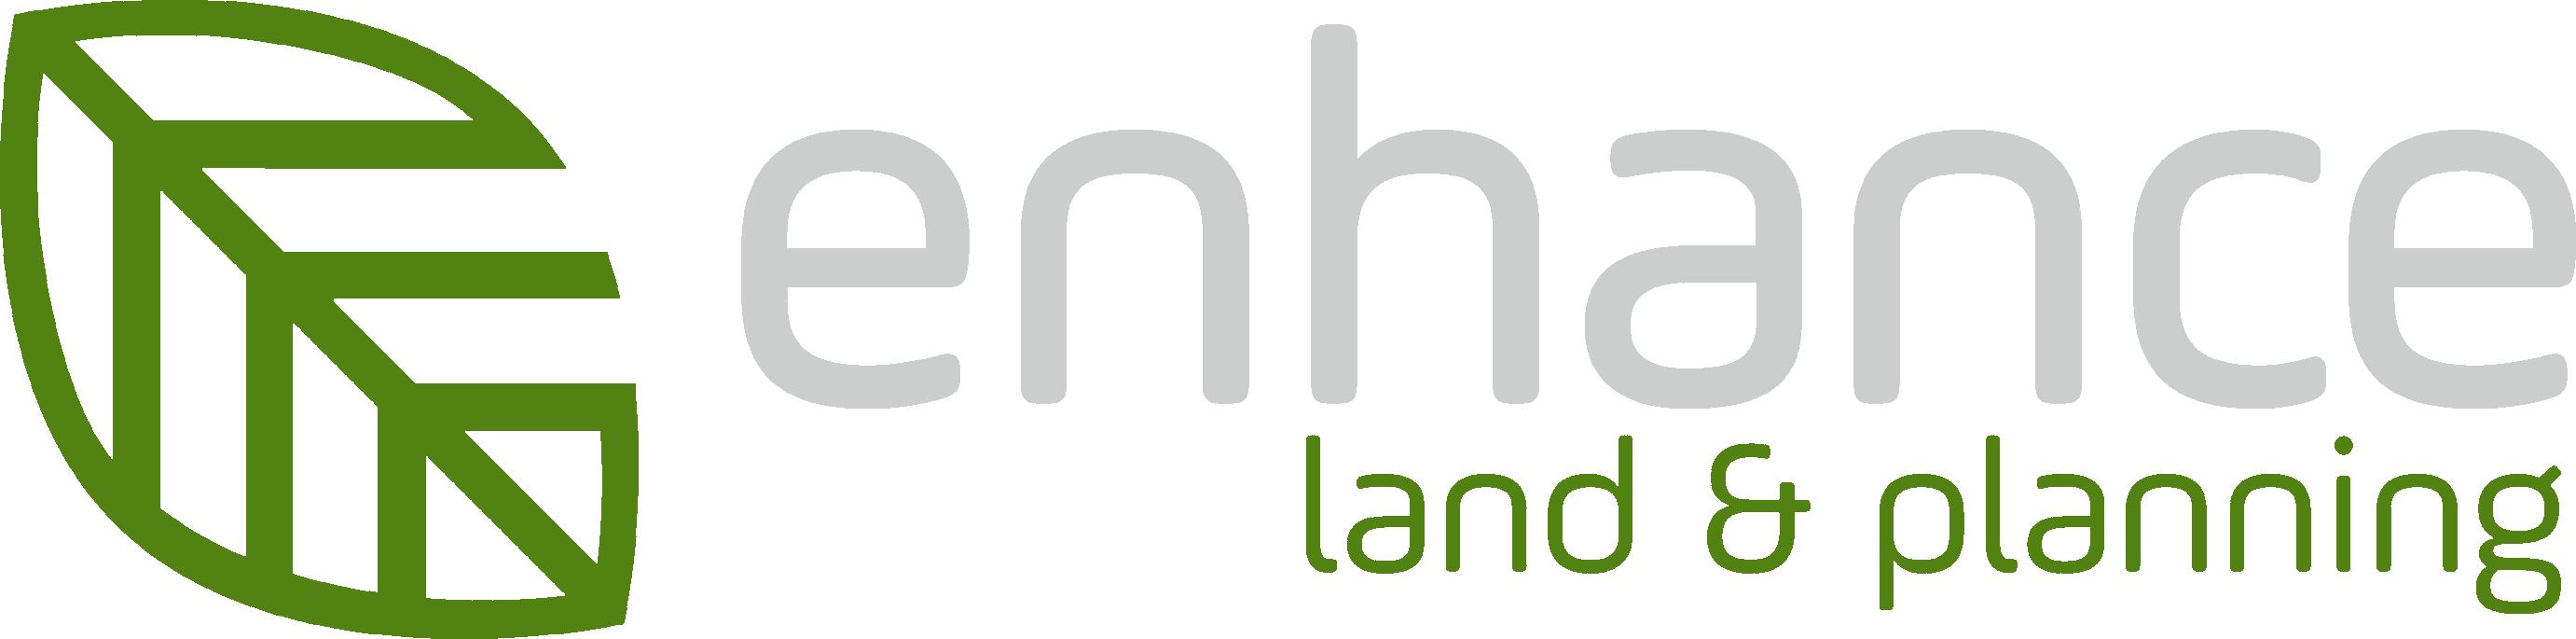 Enhance Land & Planning